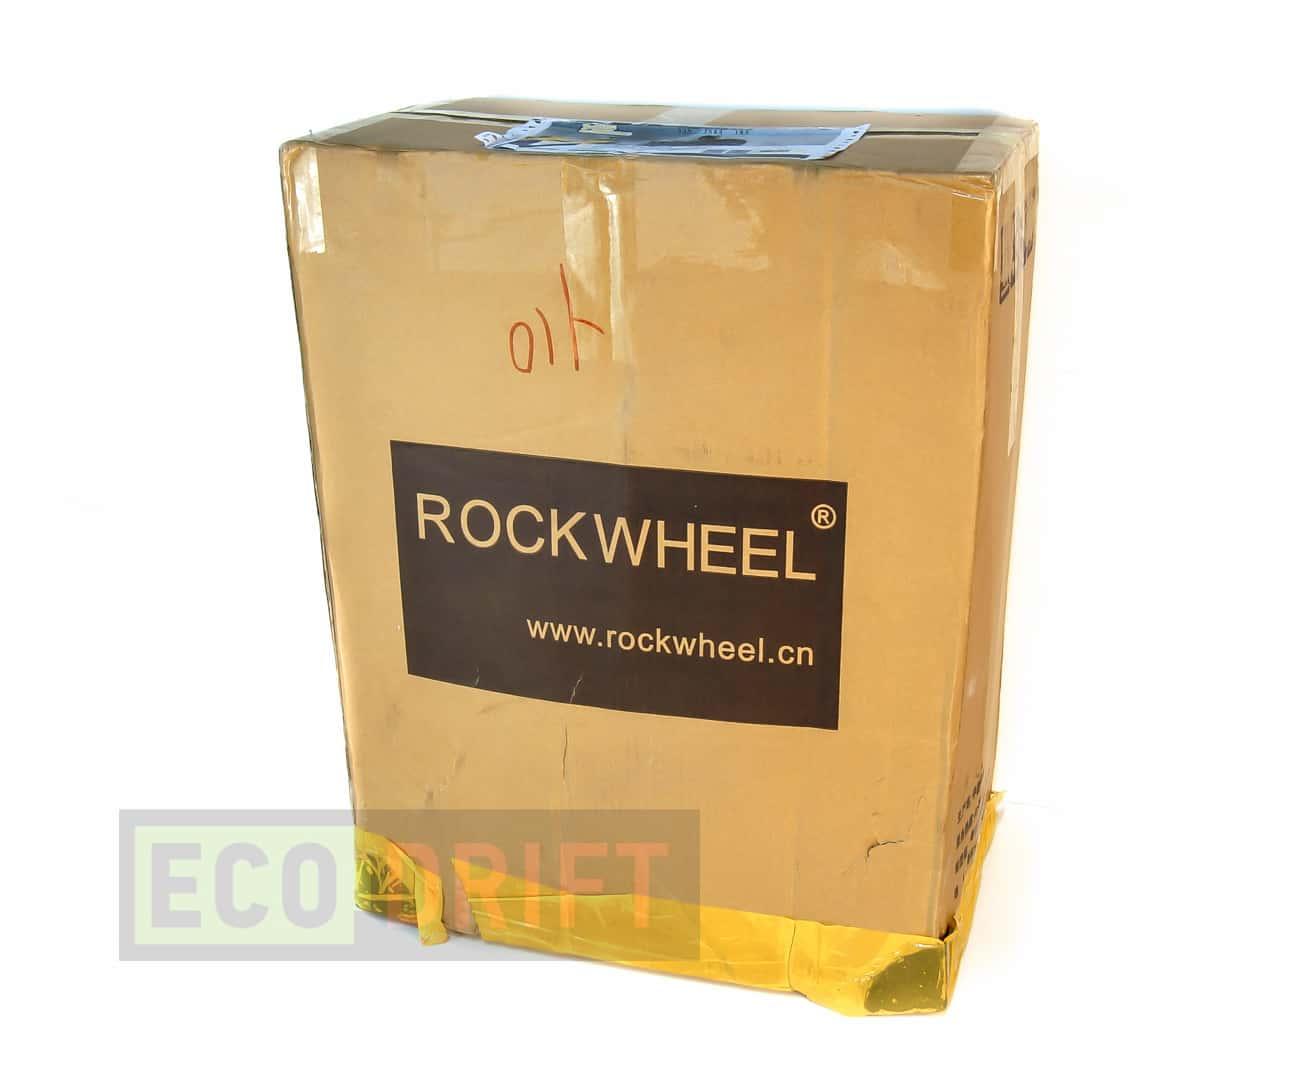 Rockwheel-GT16-korobka.jpg